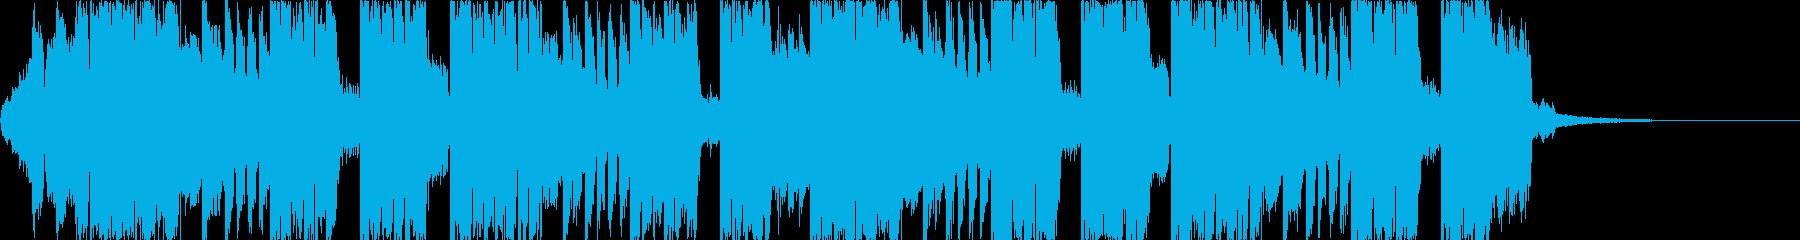 FutureBass2、洋楽、爽快、夏cの再生済みの波形